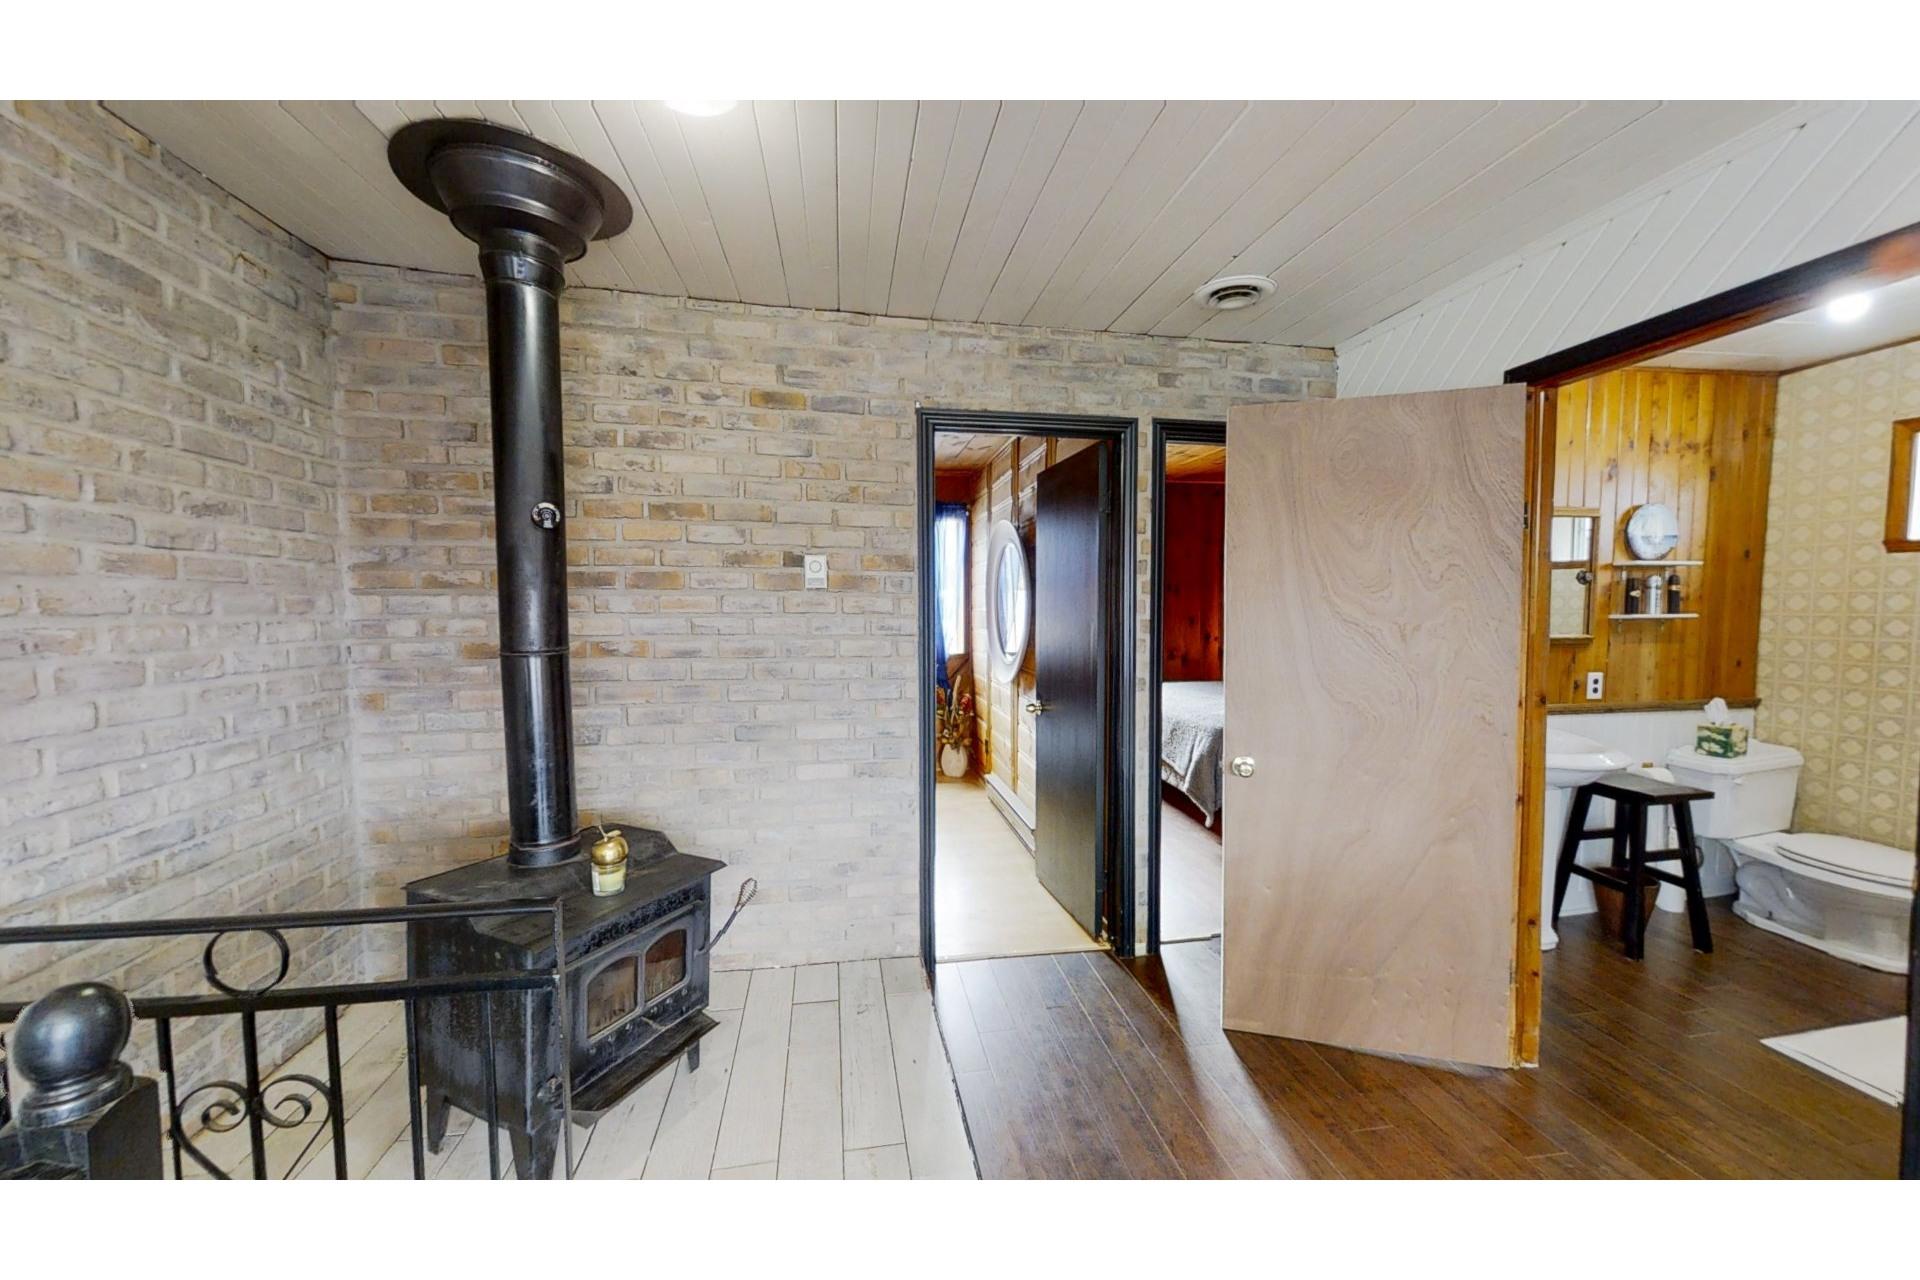 image 4 - House For sale Saint-Calixte - 7 rooms